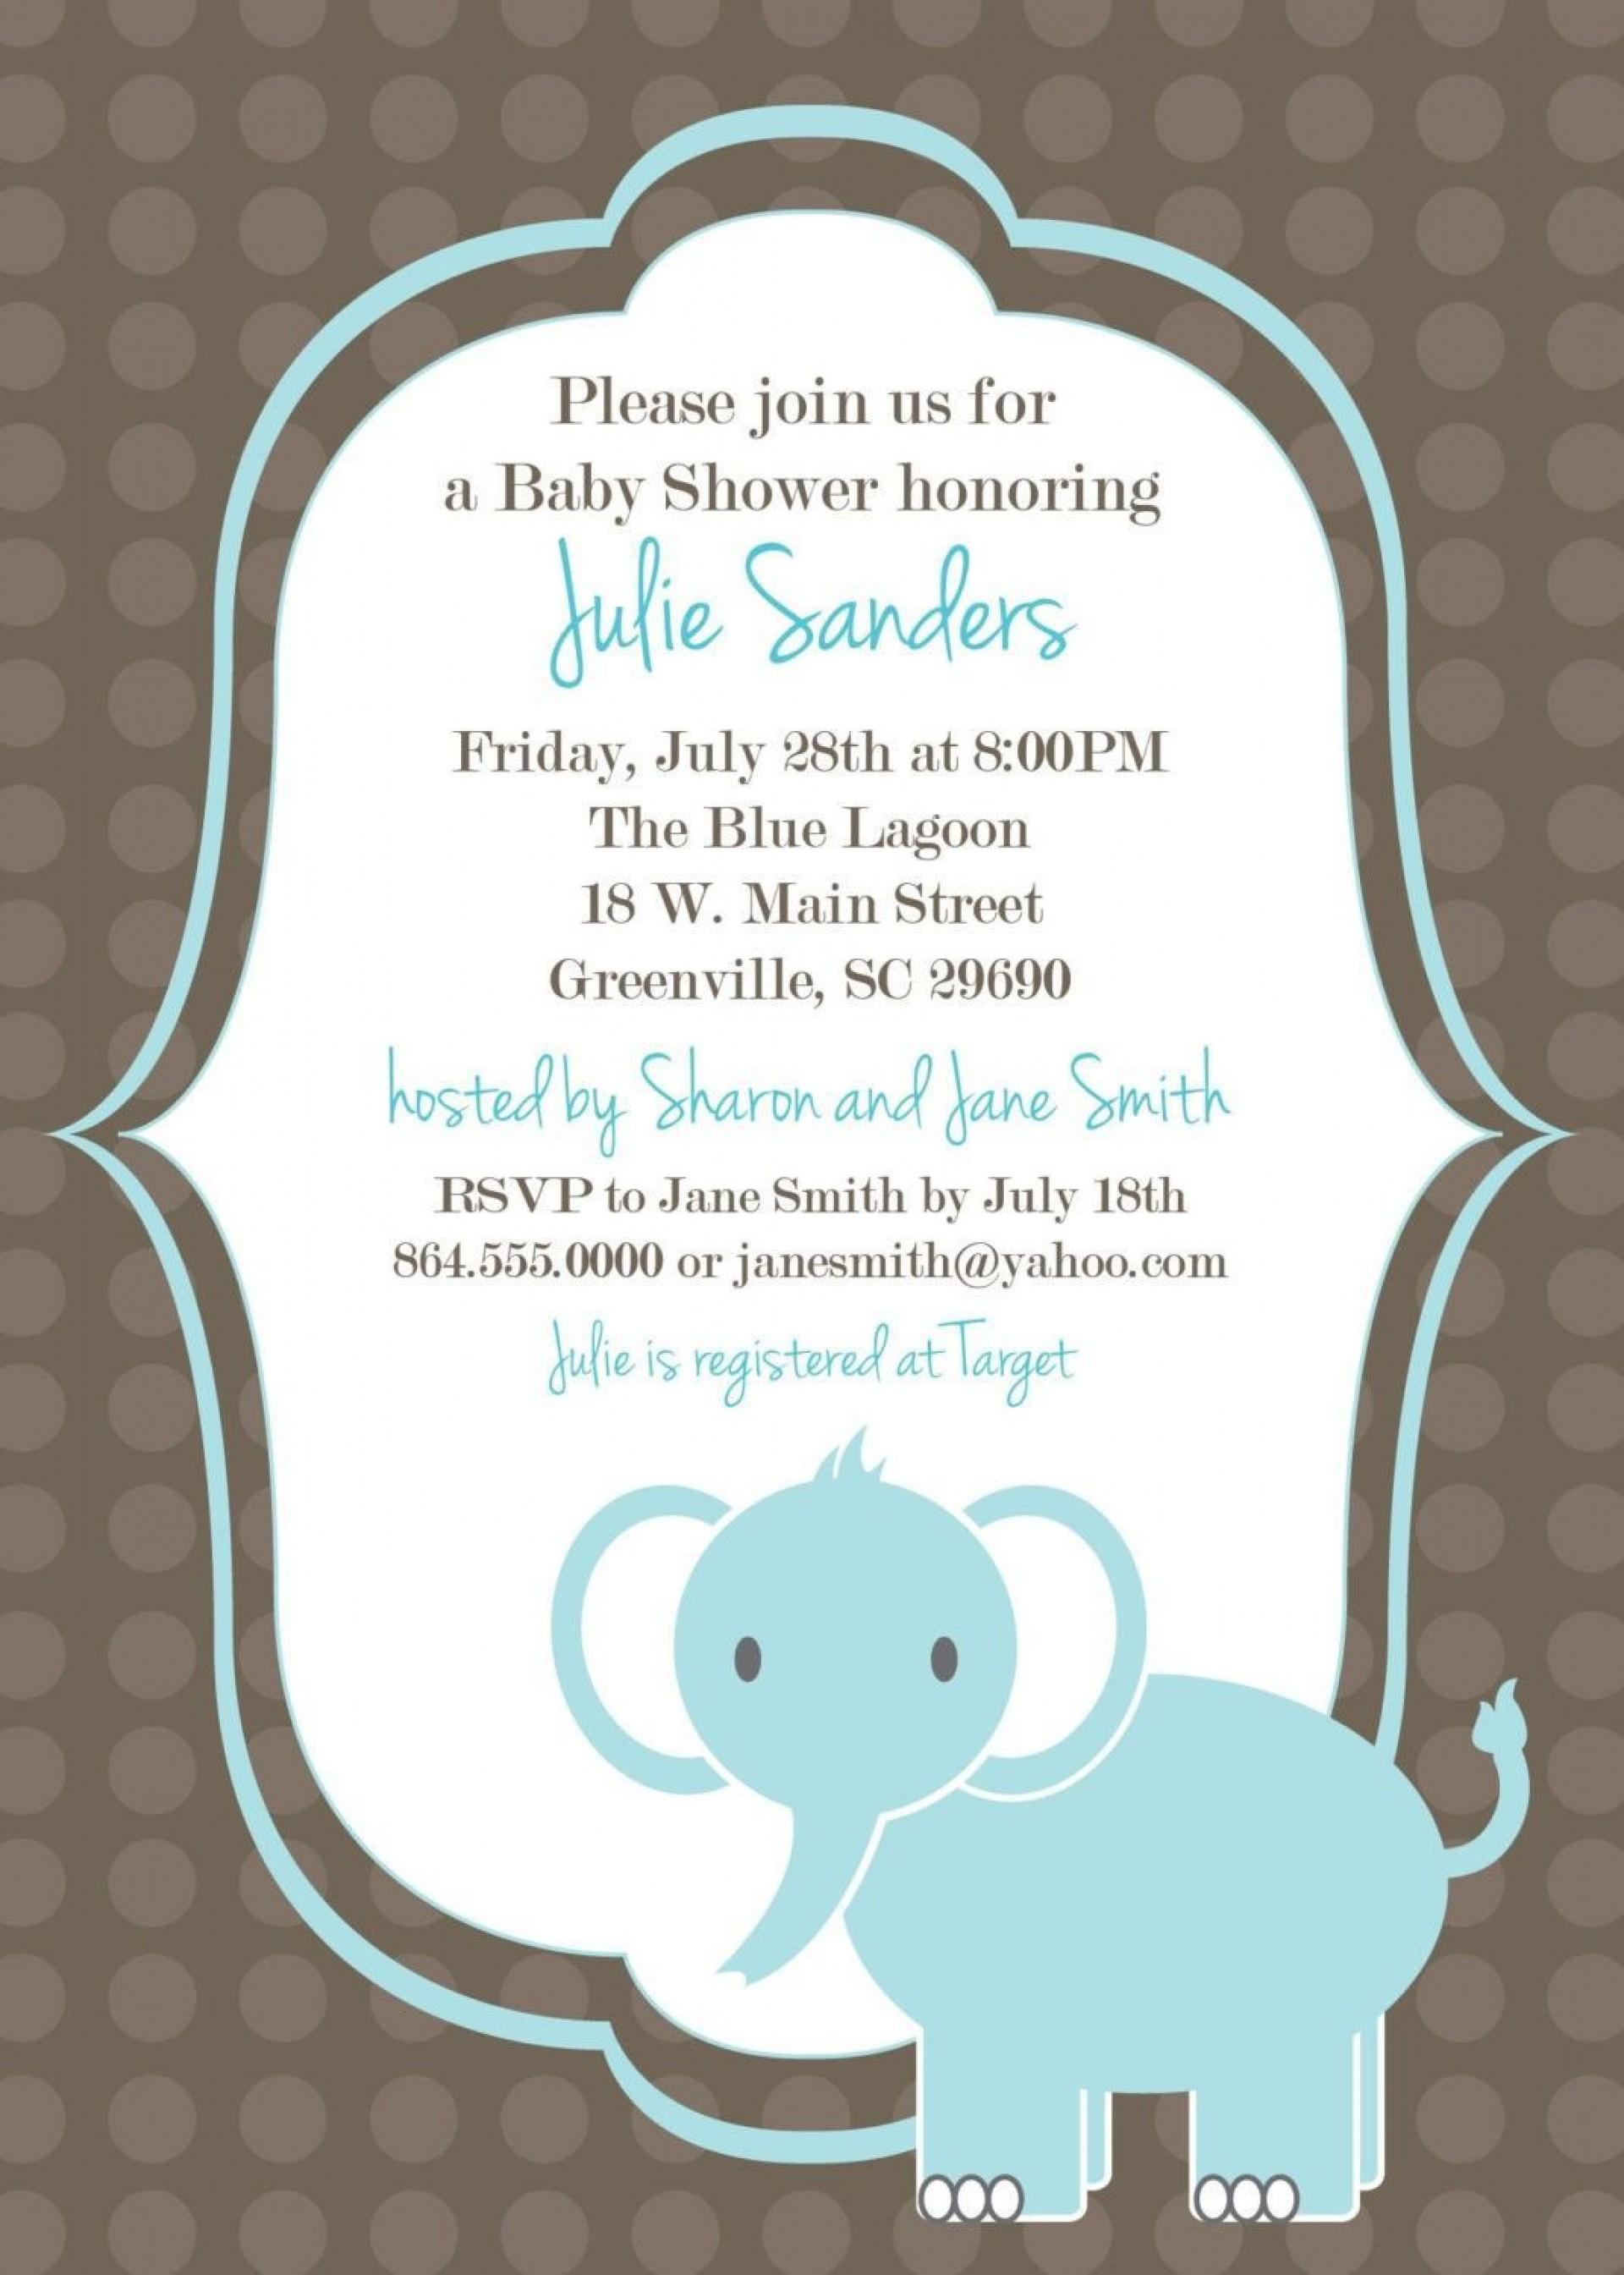 004 Unusual Baby Shower Invitation Free Template Picture  Templates Online Printable E-invitation Card Design Download1920